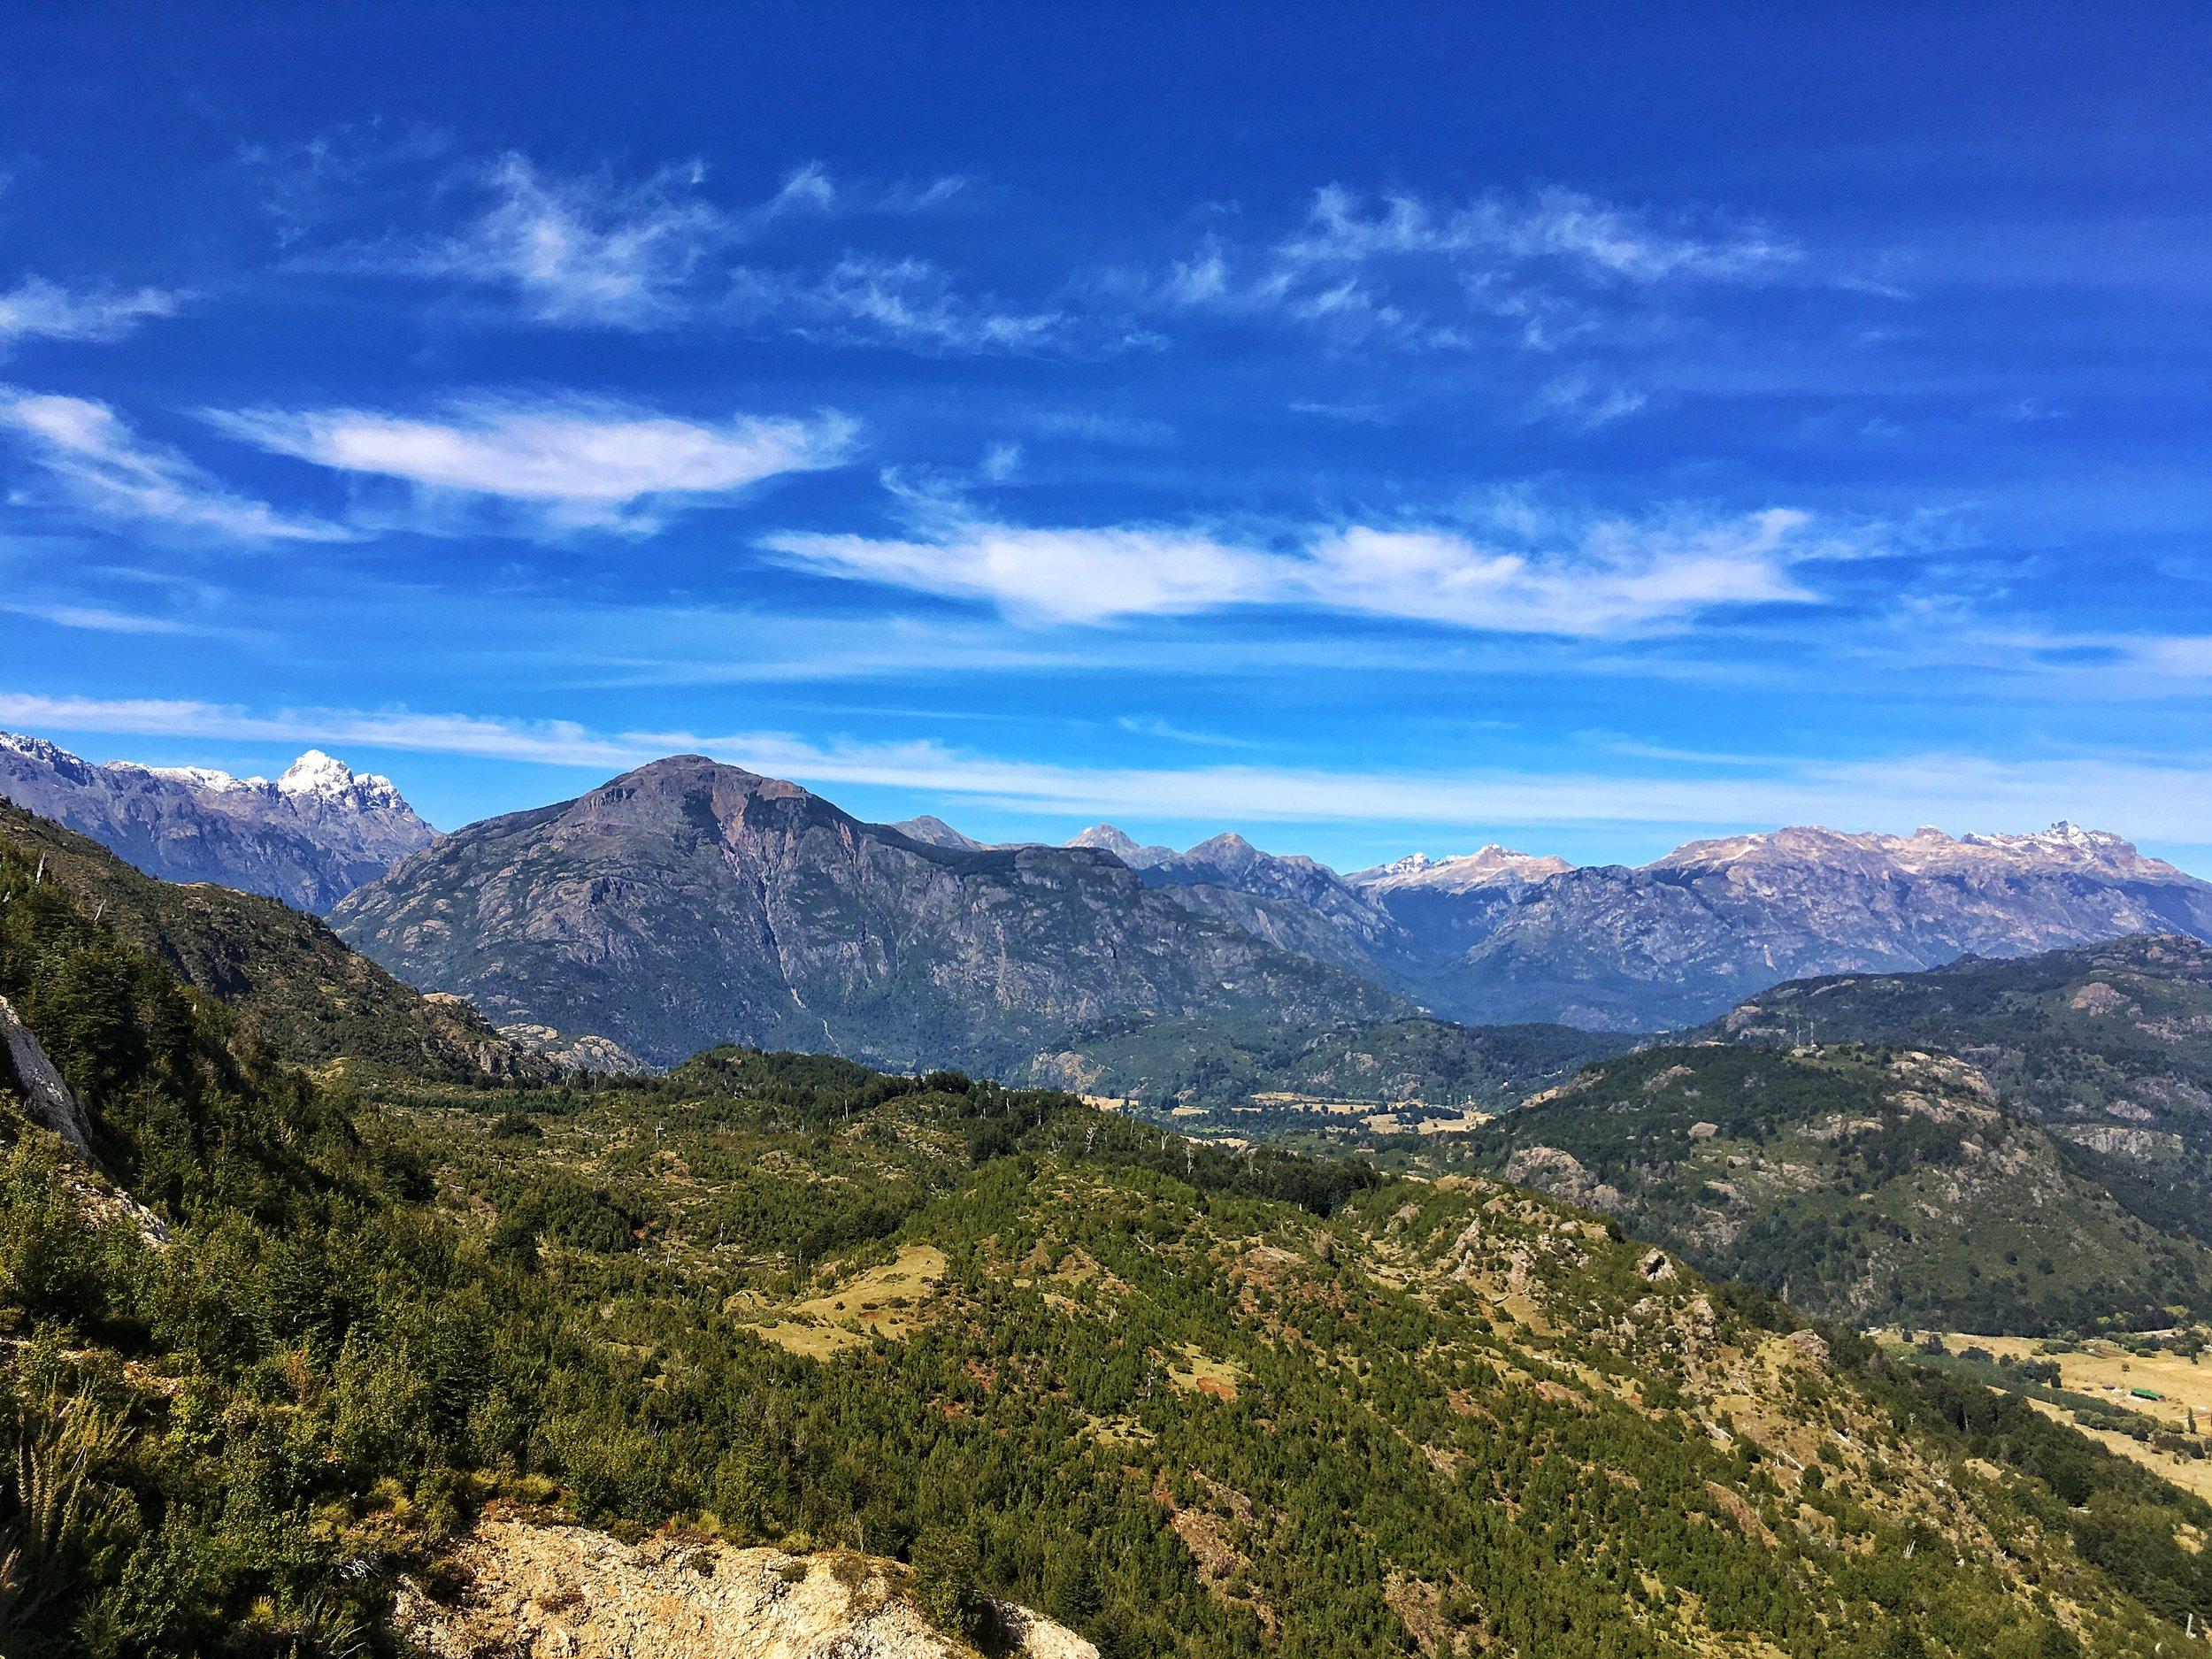 Peering into Futaleufu Valley